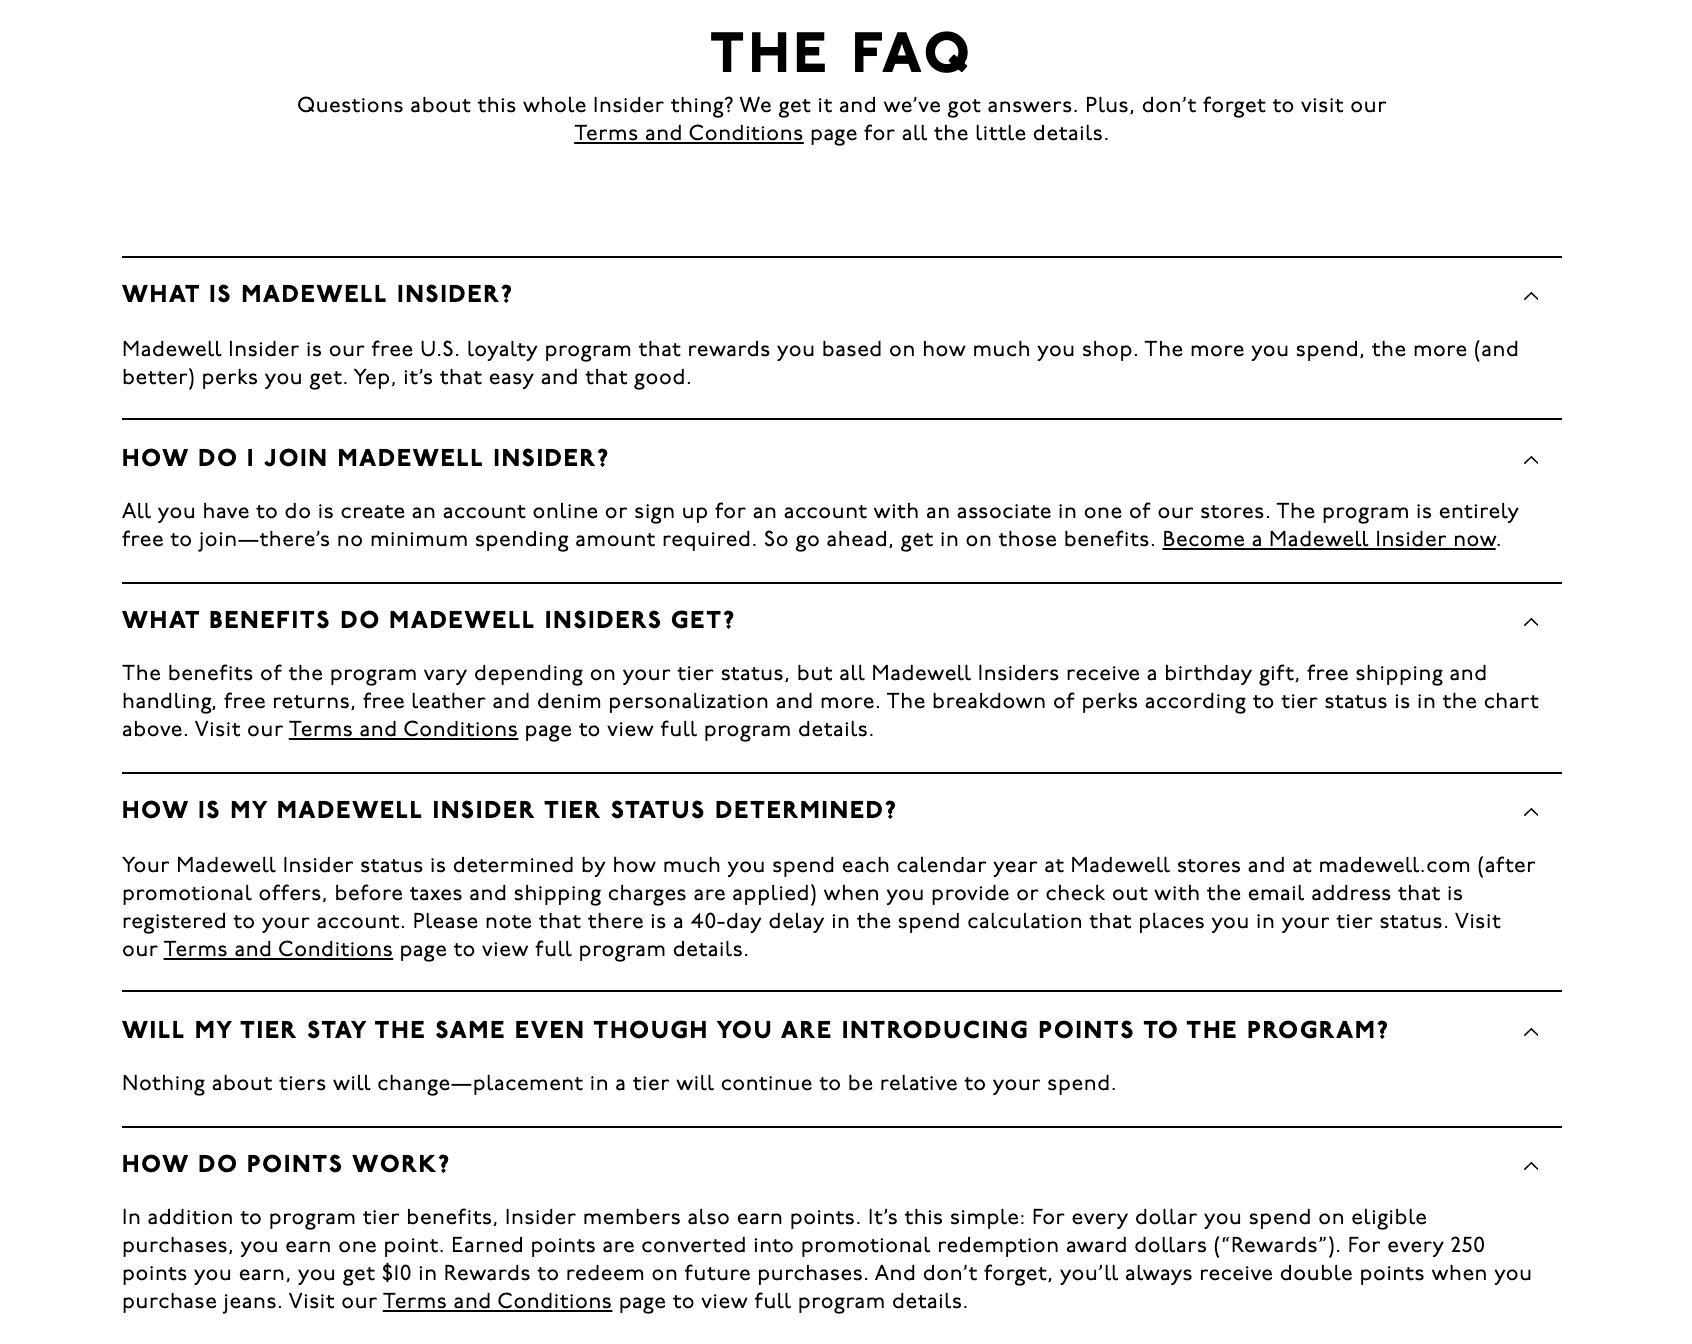 FAQ for Customer Retention